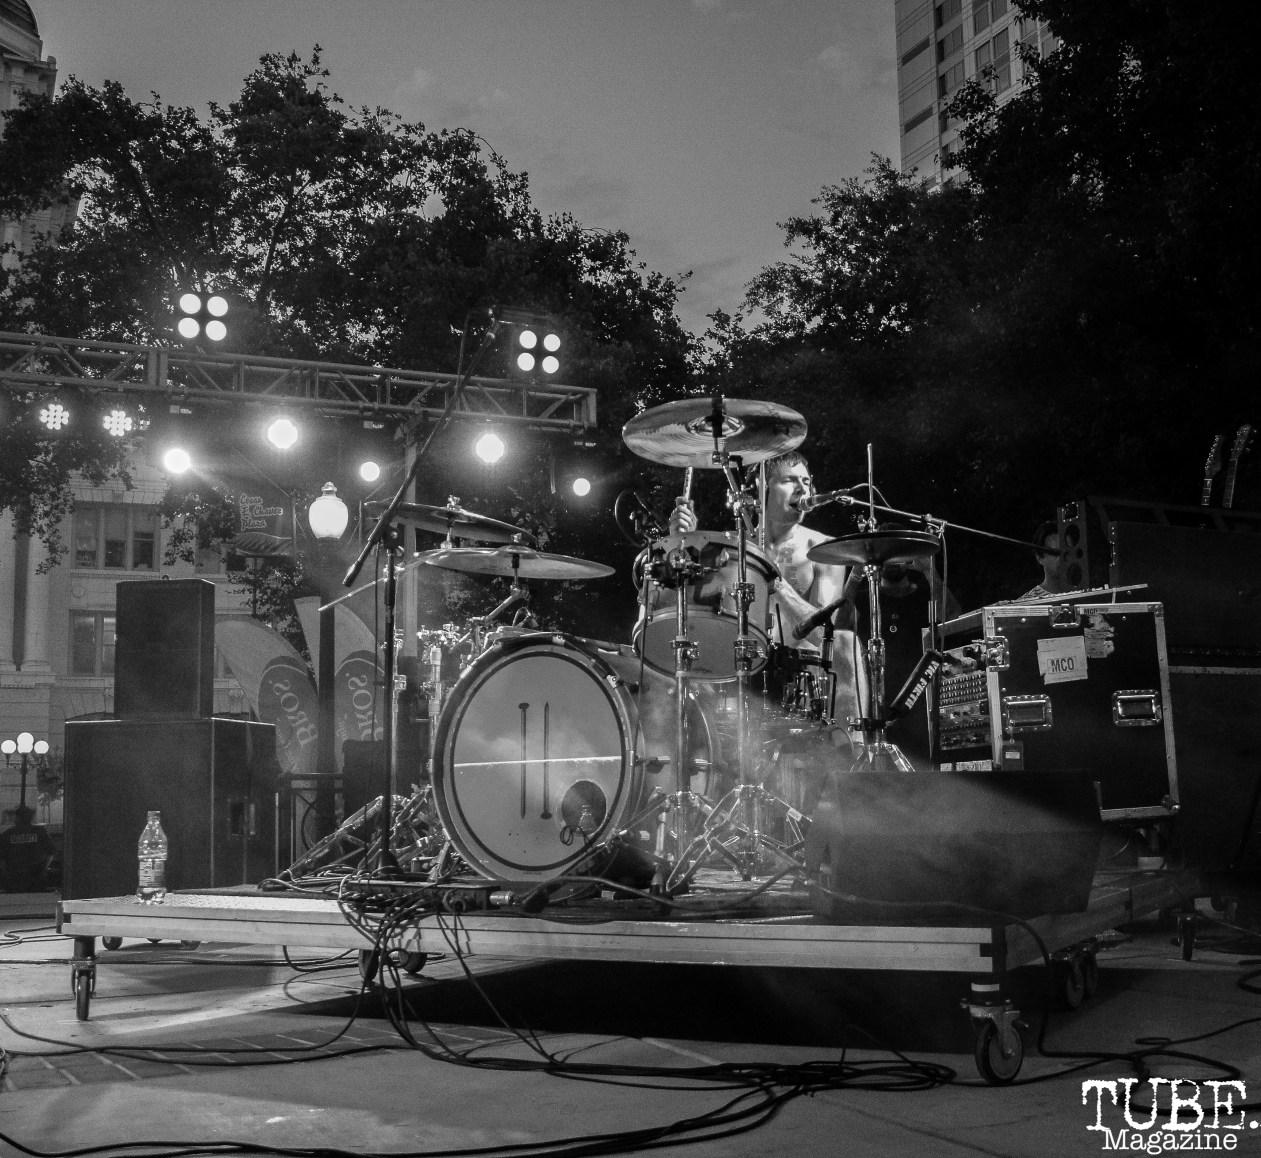 Middle Class Rut, Concerts in the Park, Cesar Chavez Park, Sacramento, CA, July 20th, 2018, Photo by Anouk Nexus